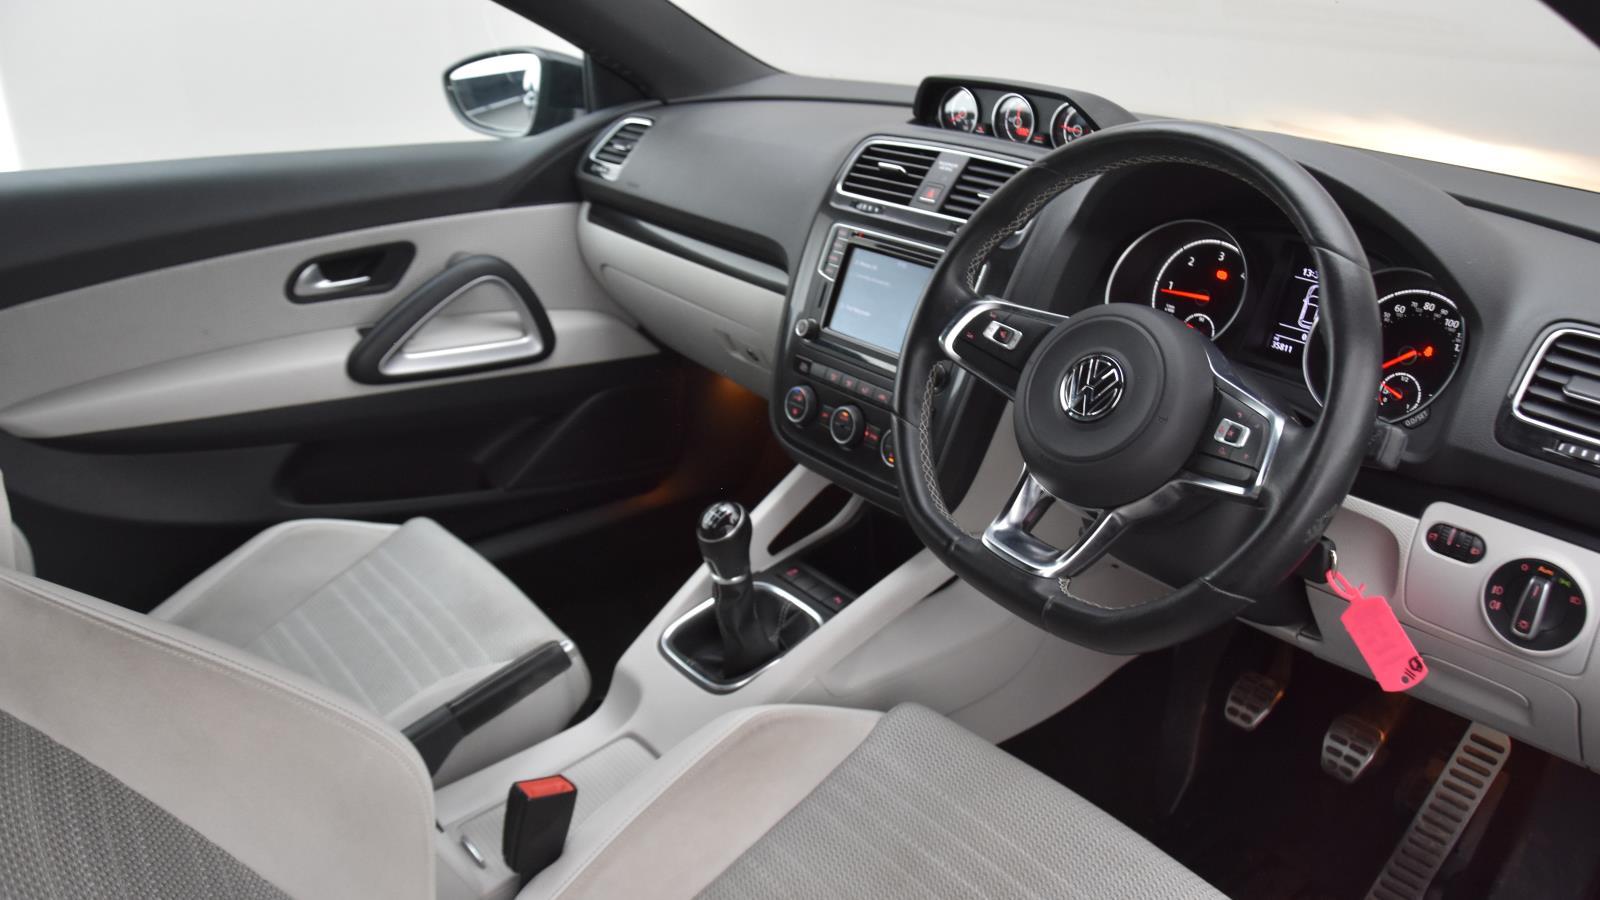 Blog: Volkswagen acronym buster